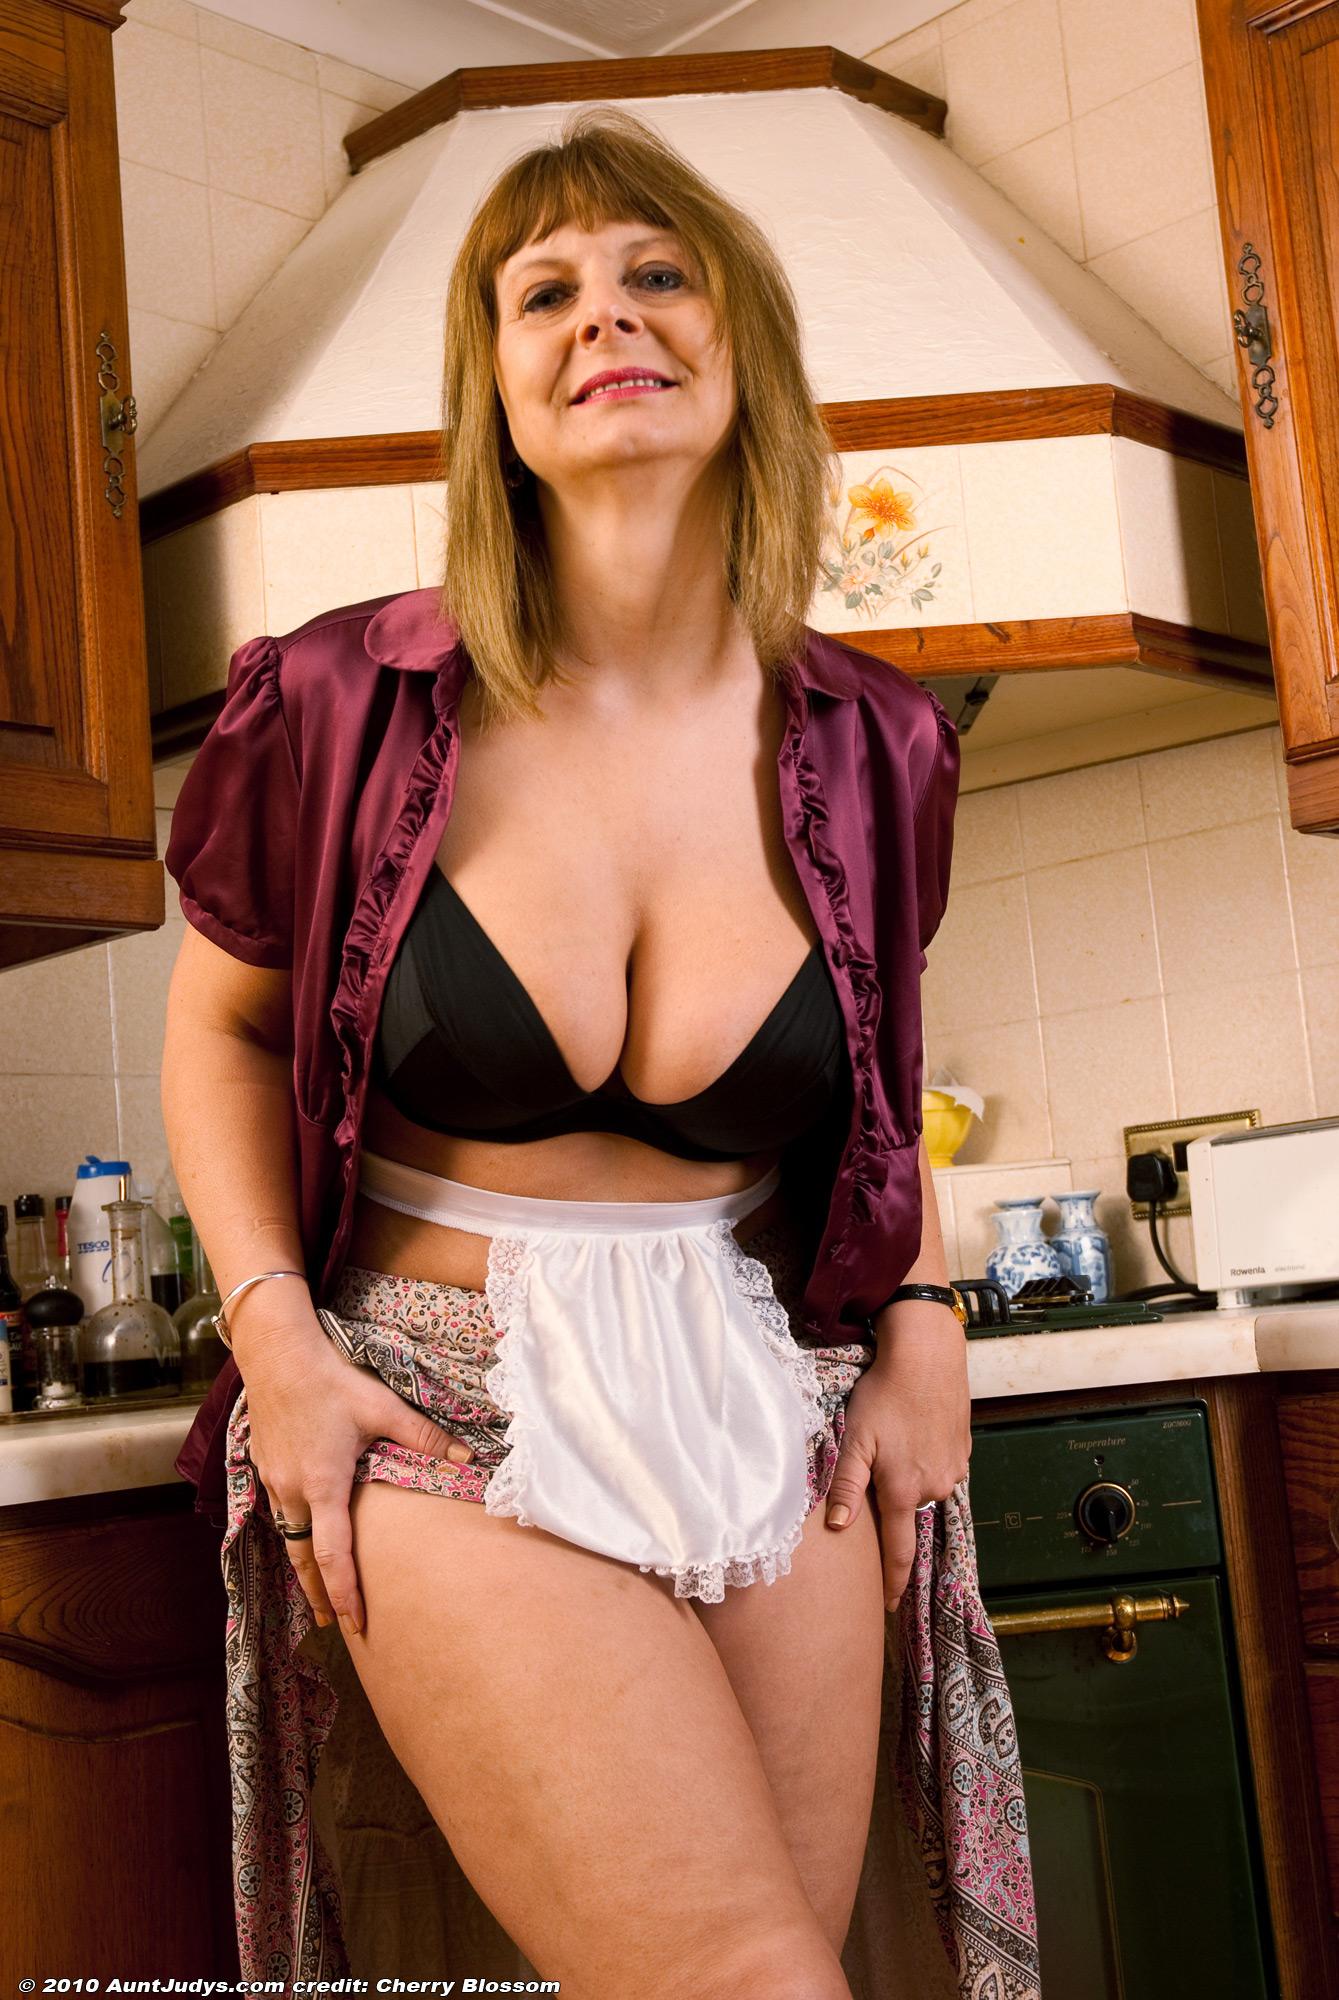 Latina erotic images